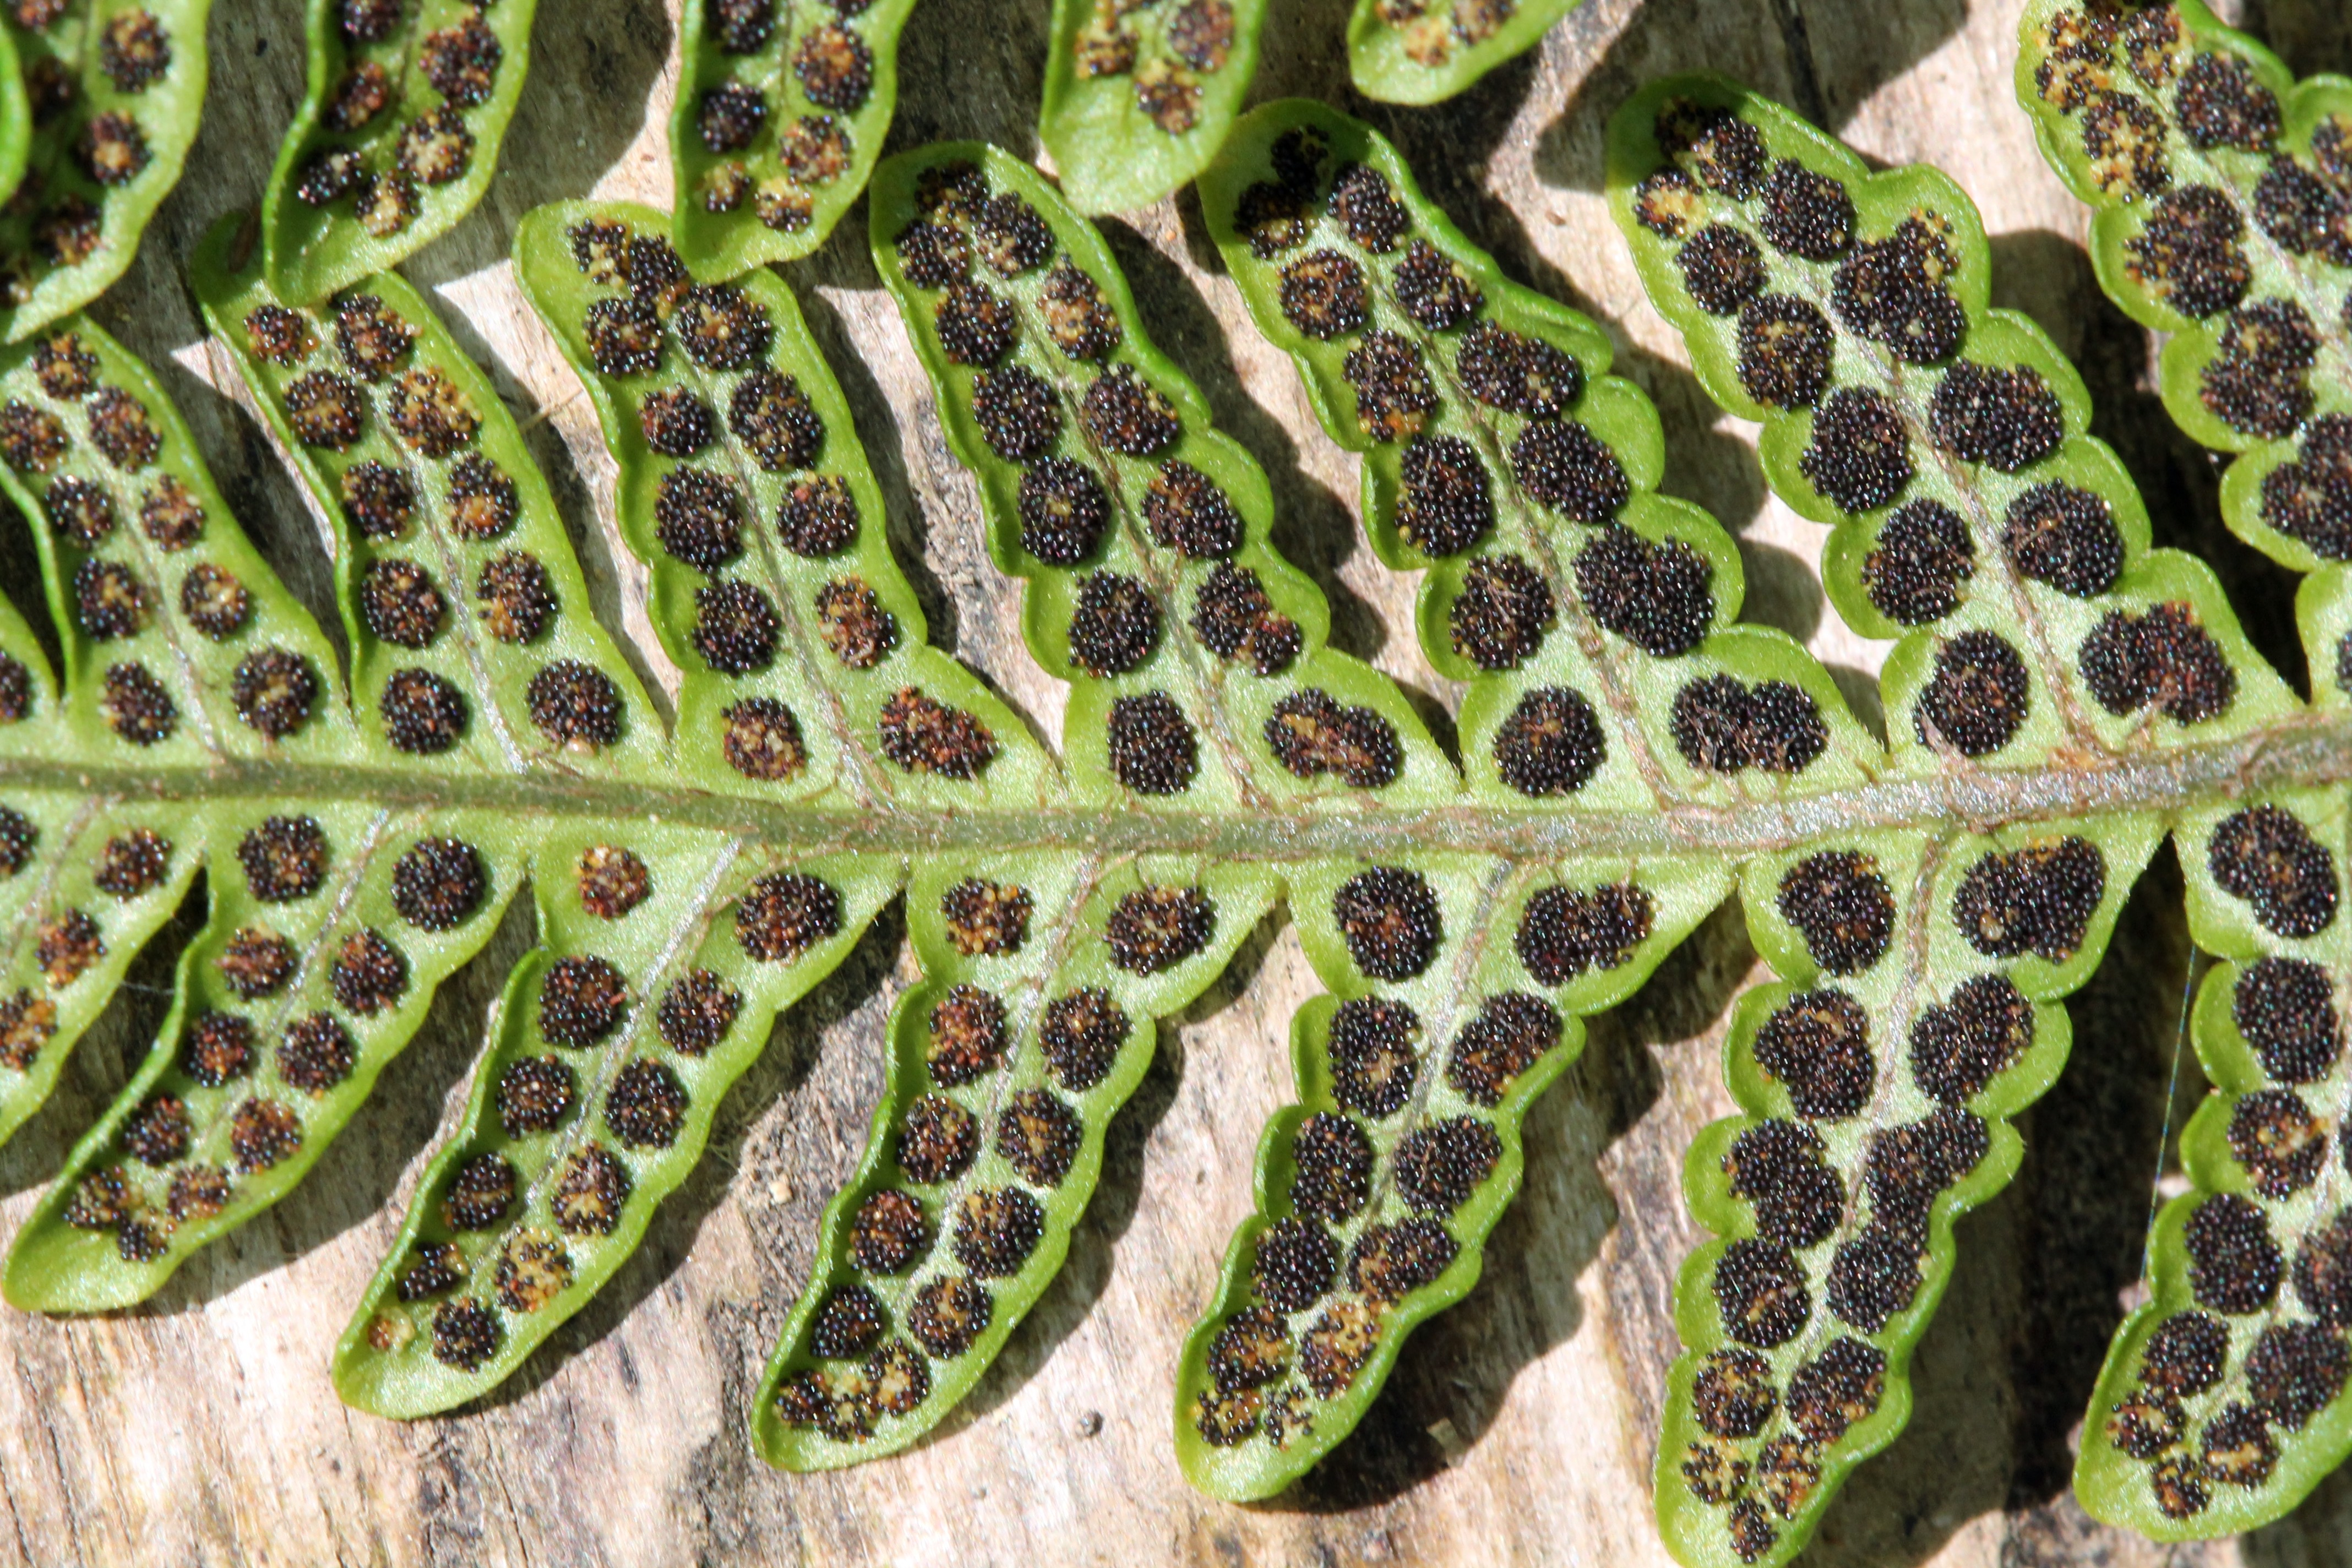 Megalastrum macrotheca